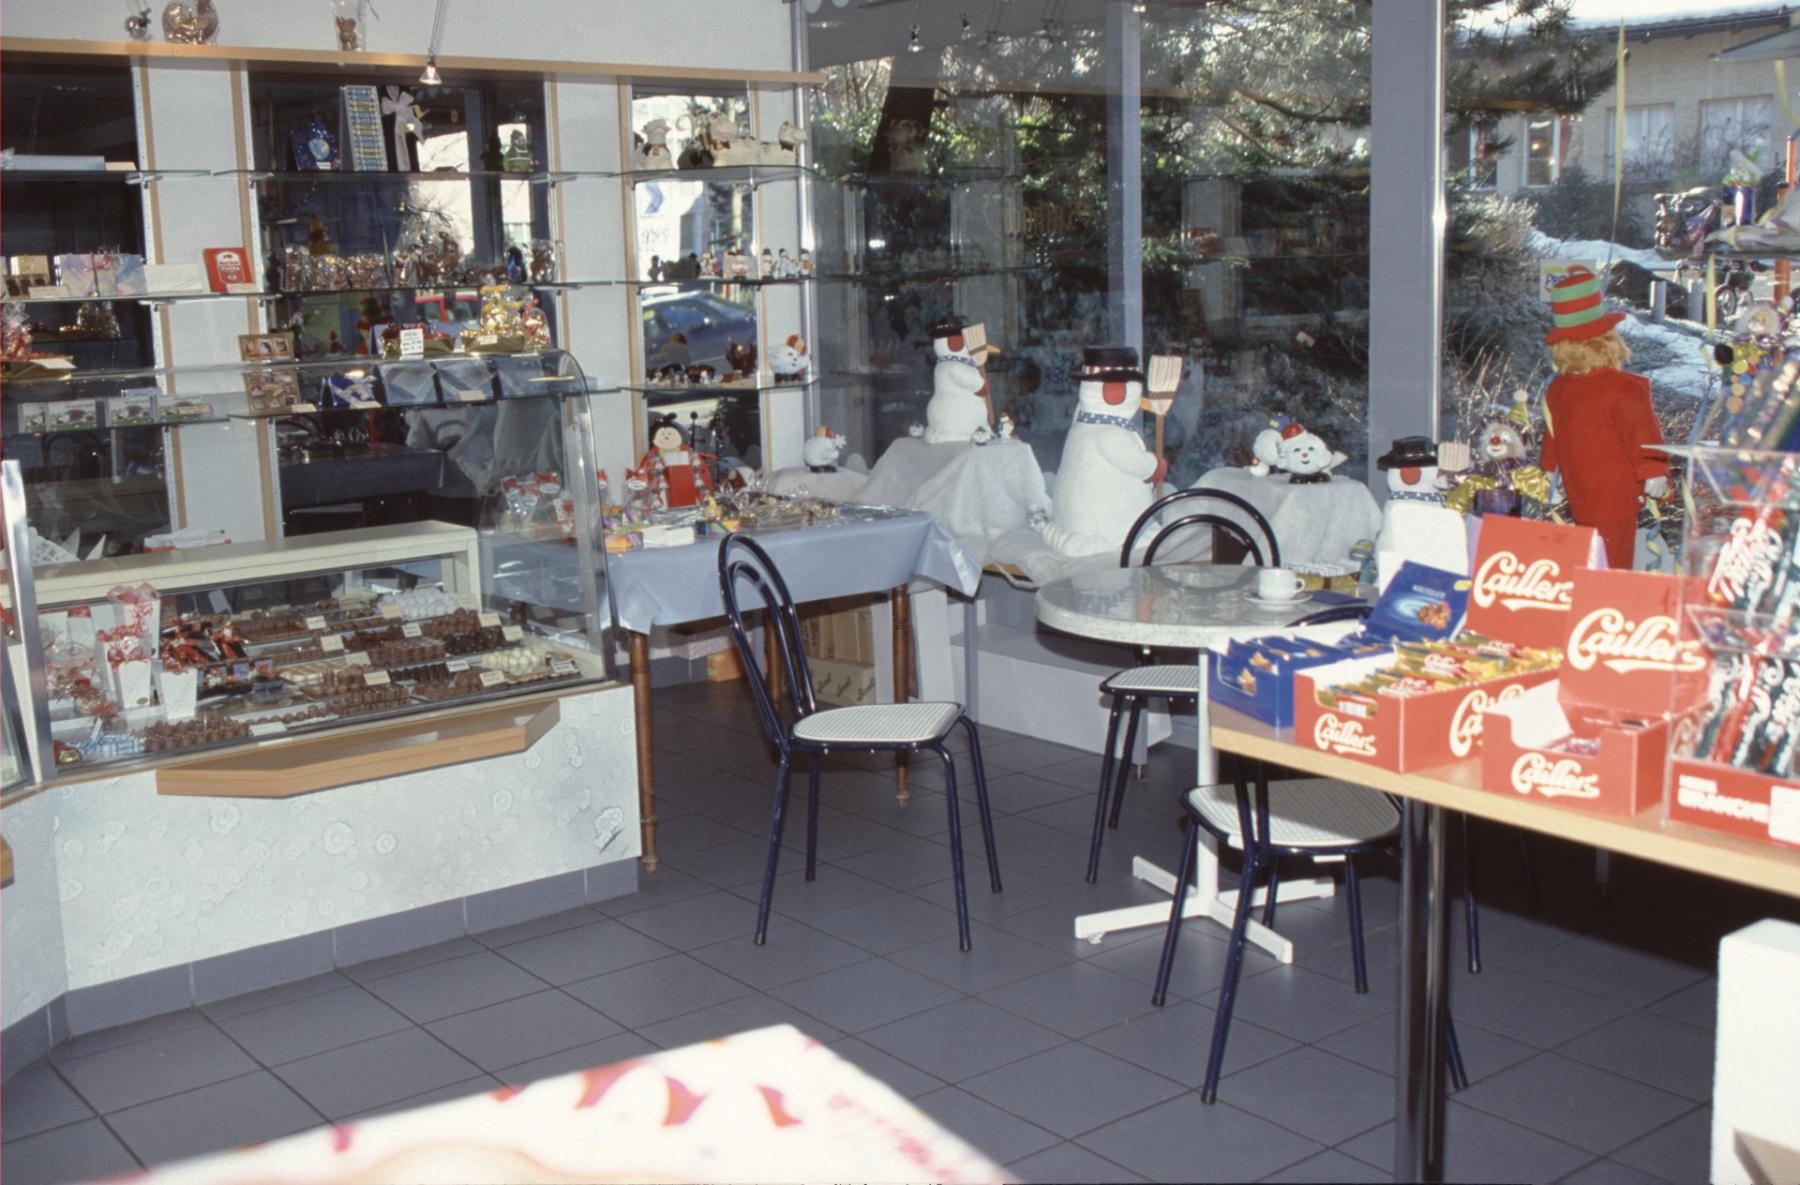 Bäckerei Conditorei Rathgeb (Sitzecke)